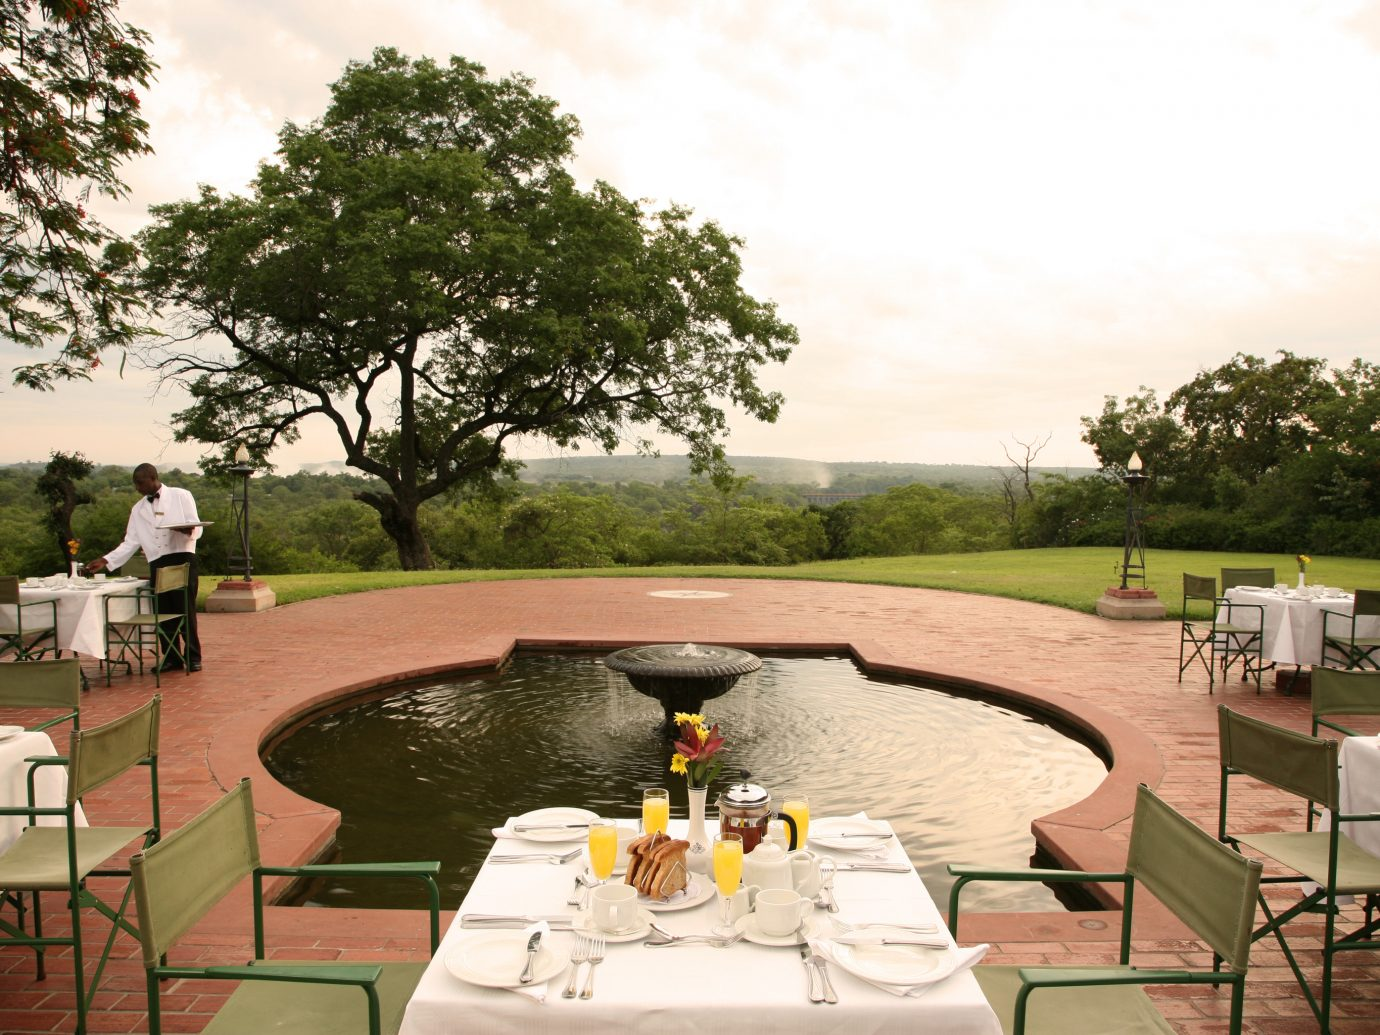 outdoor dining at Victoria Falls Hotel, Zimbabwe